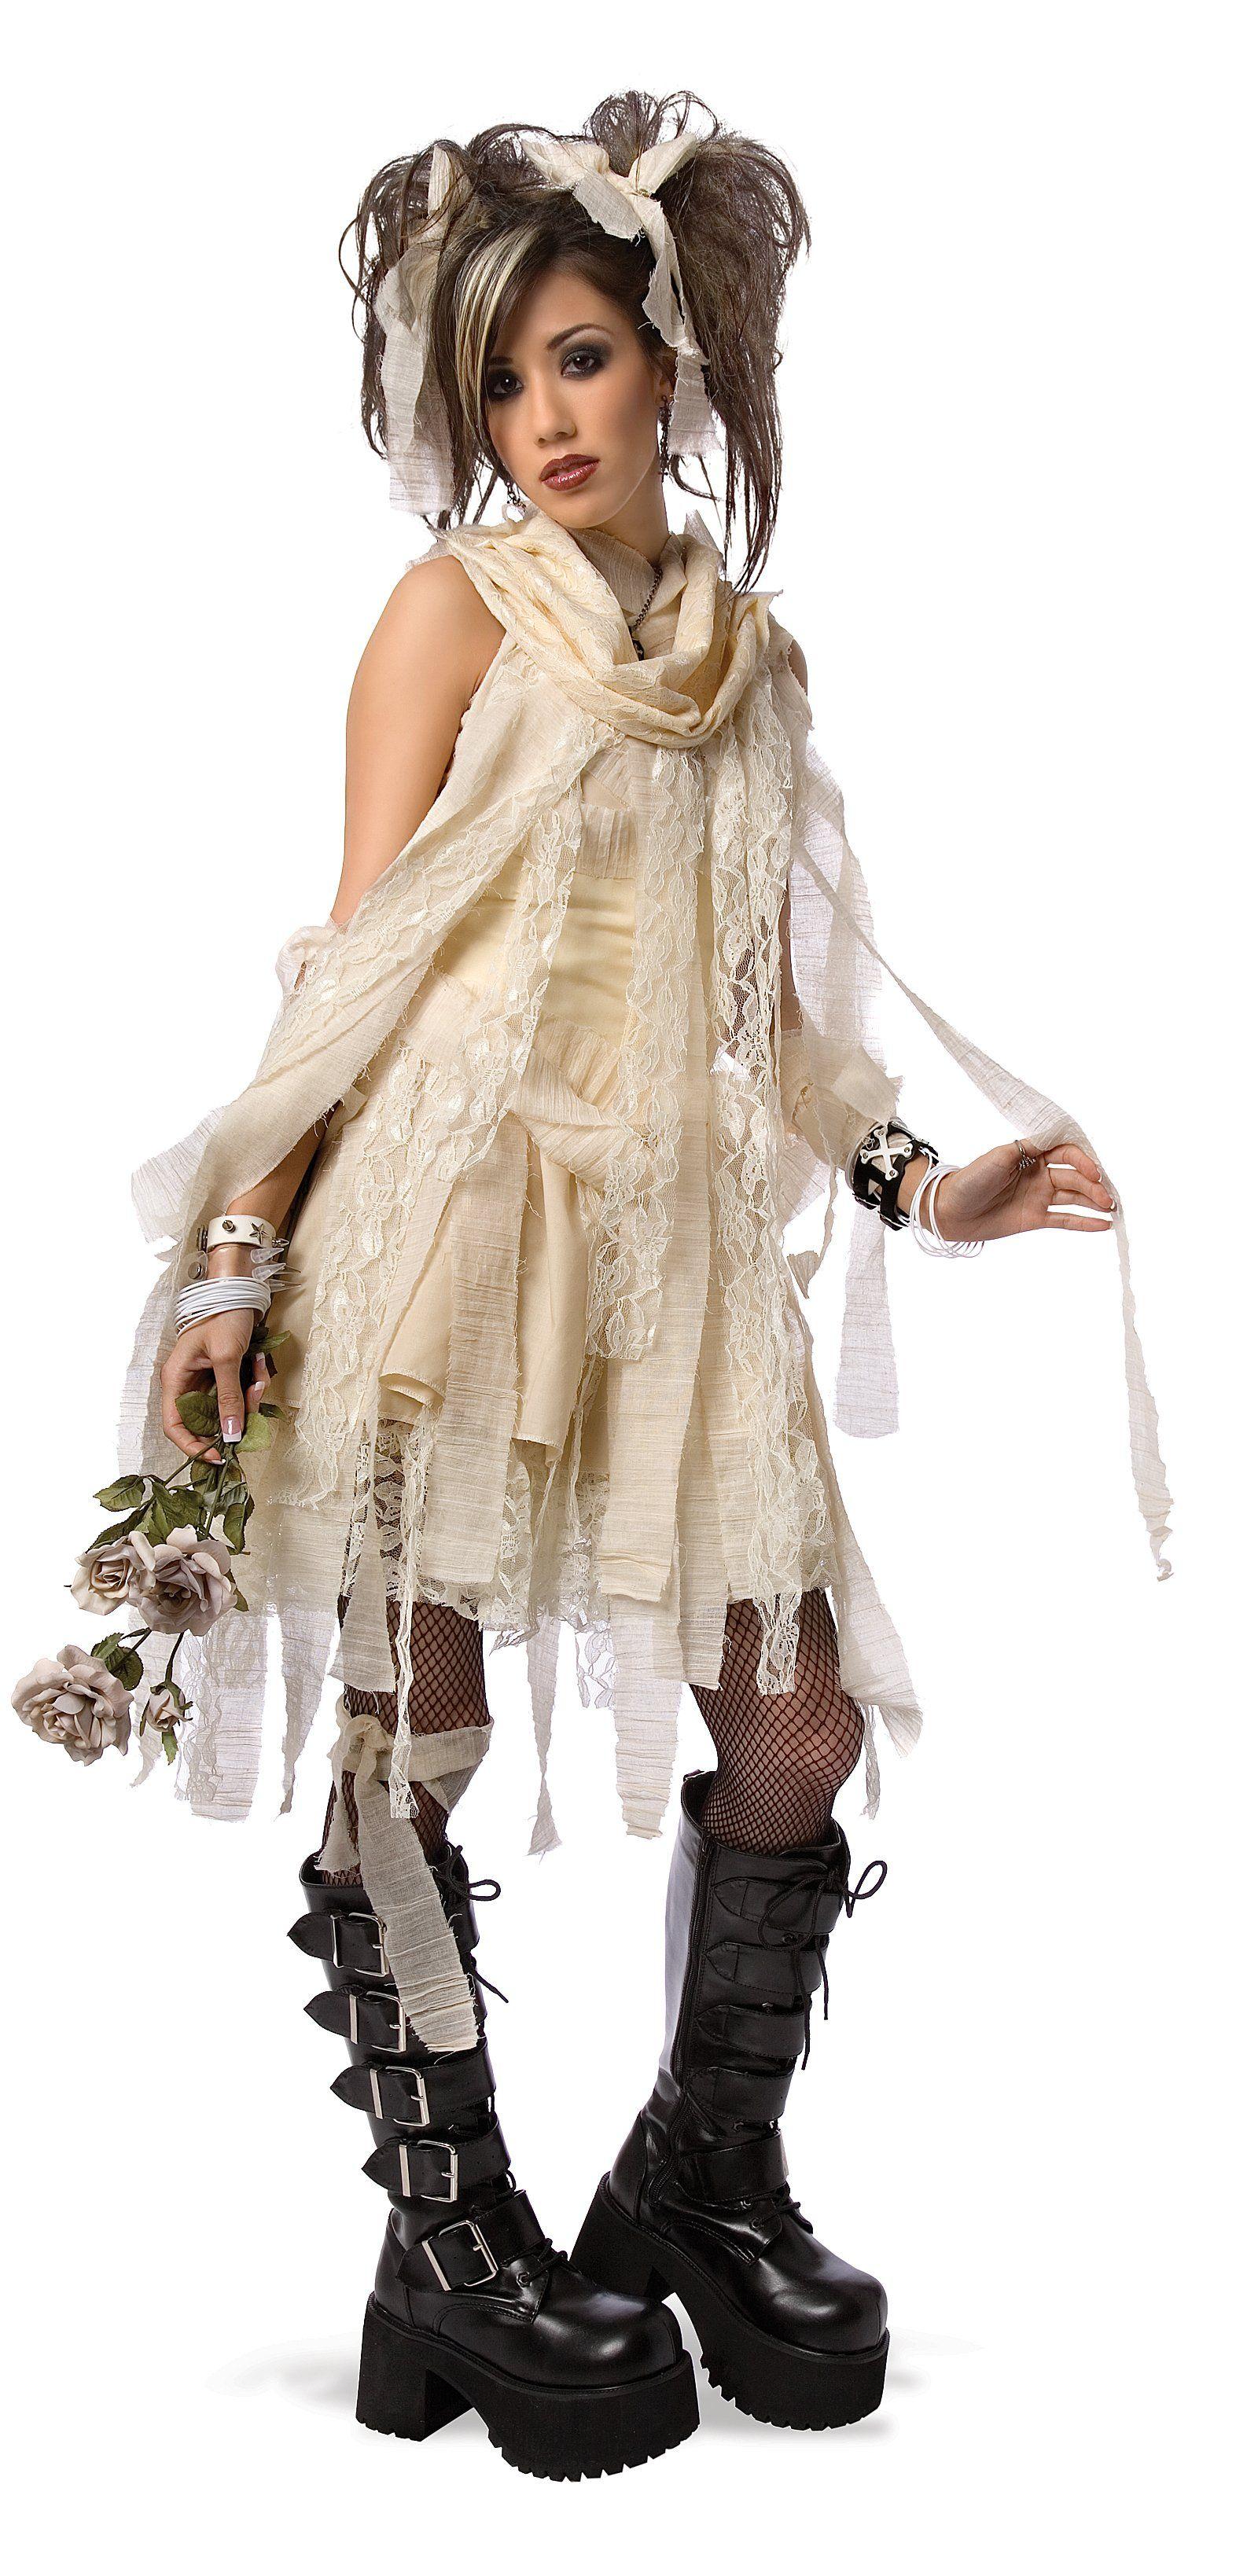 Gothic Mummy Child/Teen Costume - $21.55 - Mummy Costumes at aWise ...